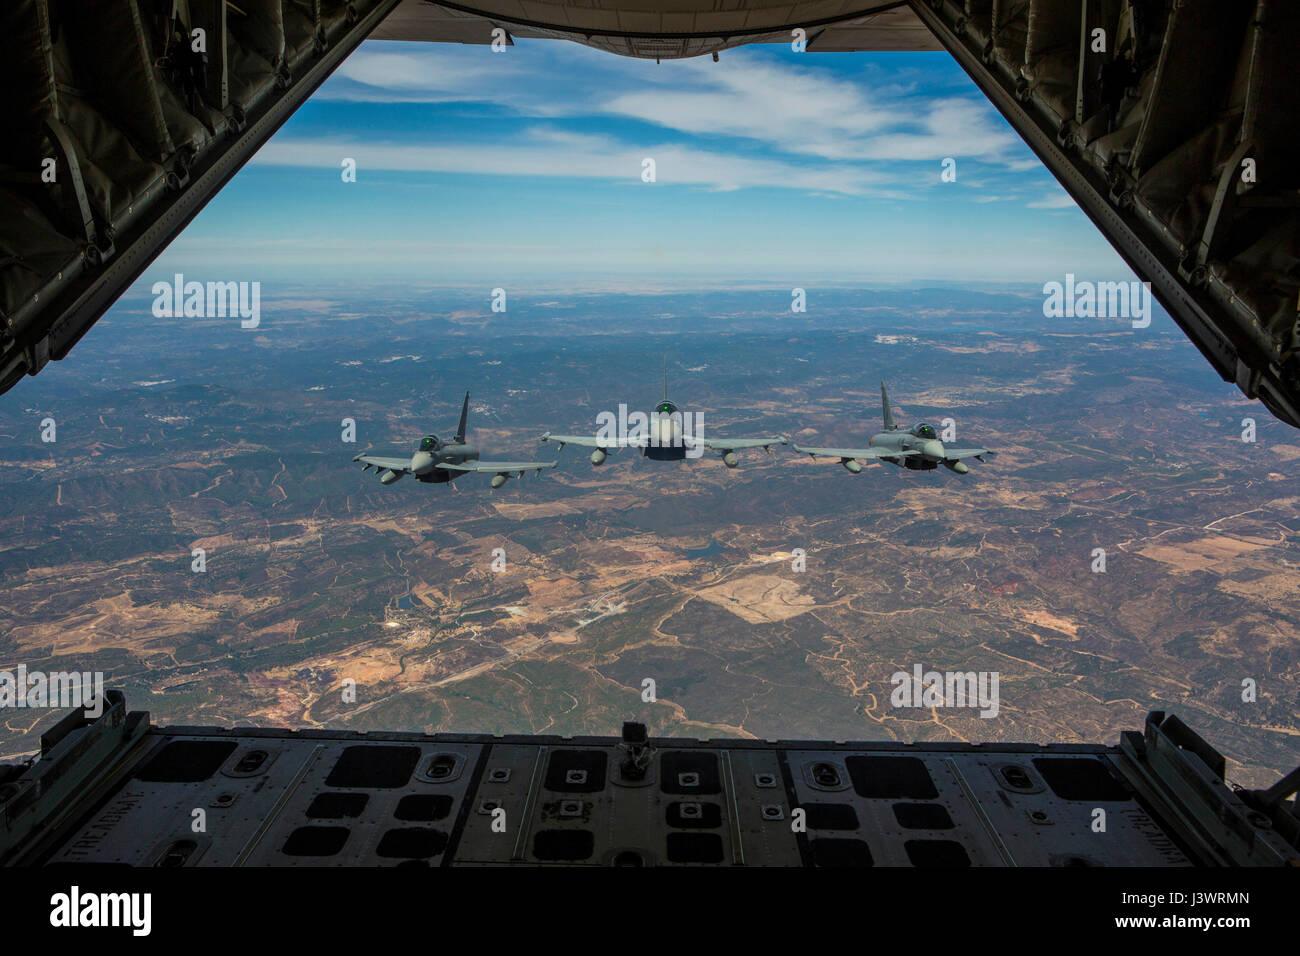 Three Spanish Air Force Eurofighter Typhoon combat aircraft escort a USMC KC-130J Hercules tactical aircraft during - Stock Image